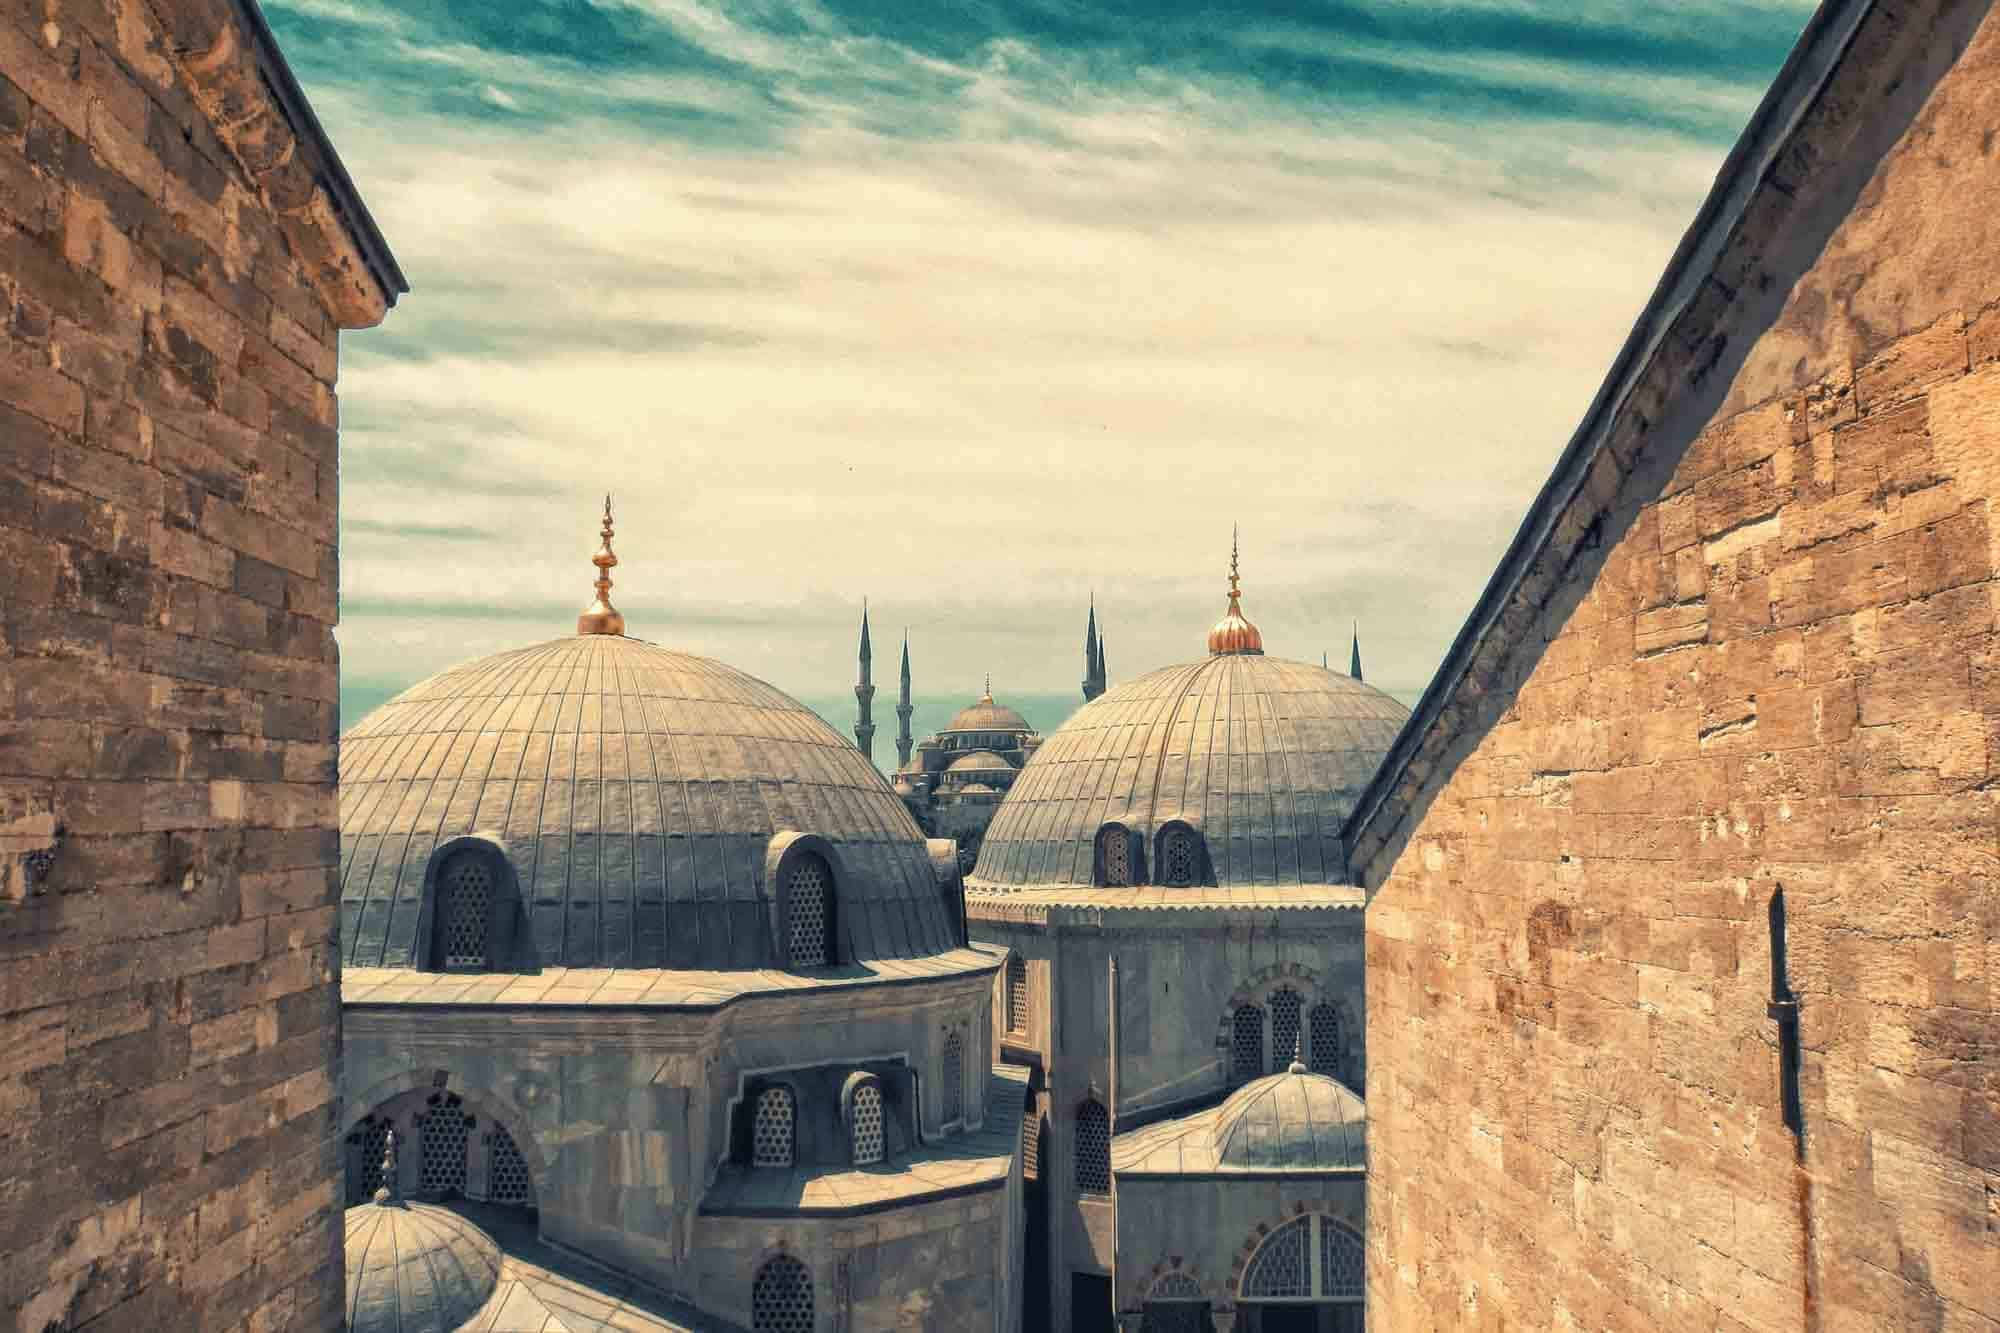 estambul-turquia-rohan-reddy-unsplash